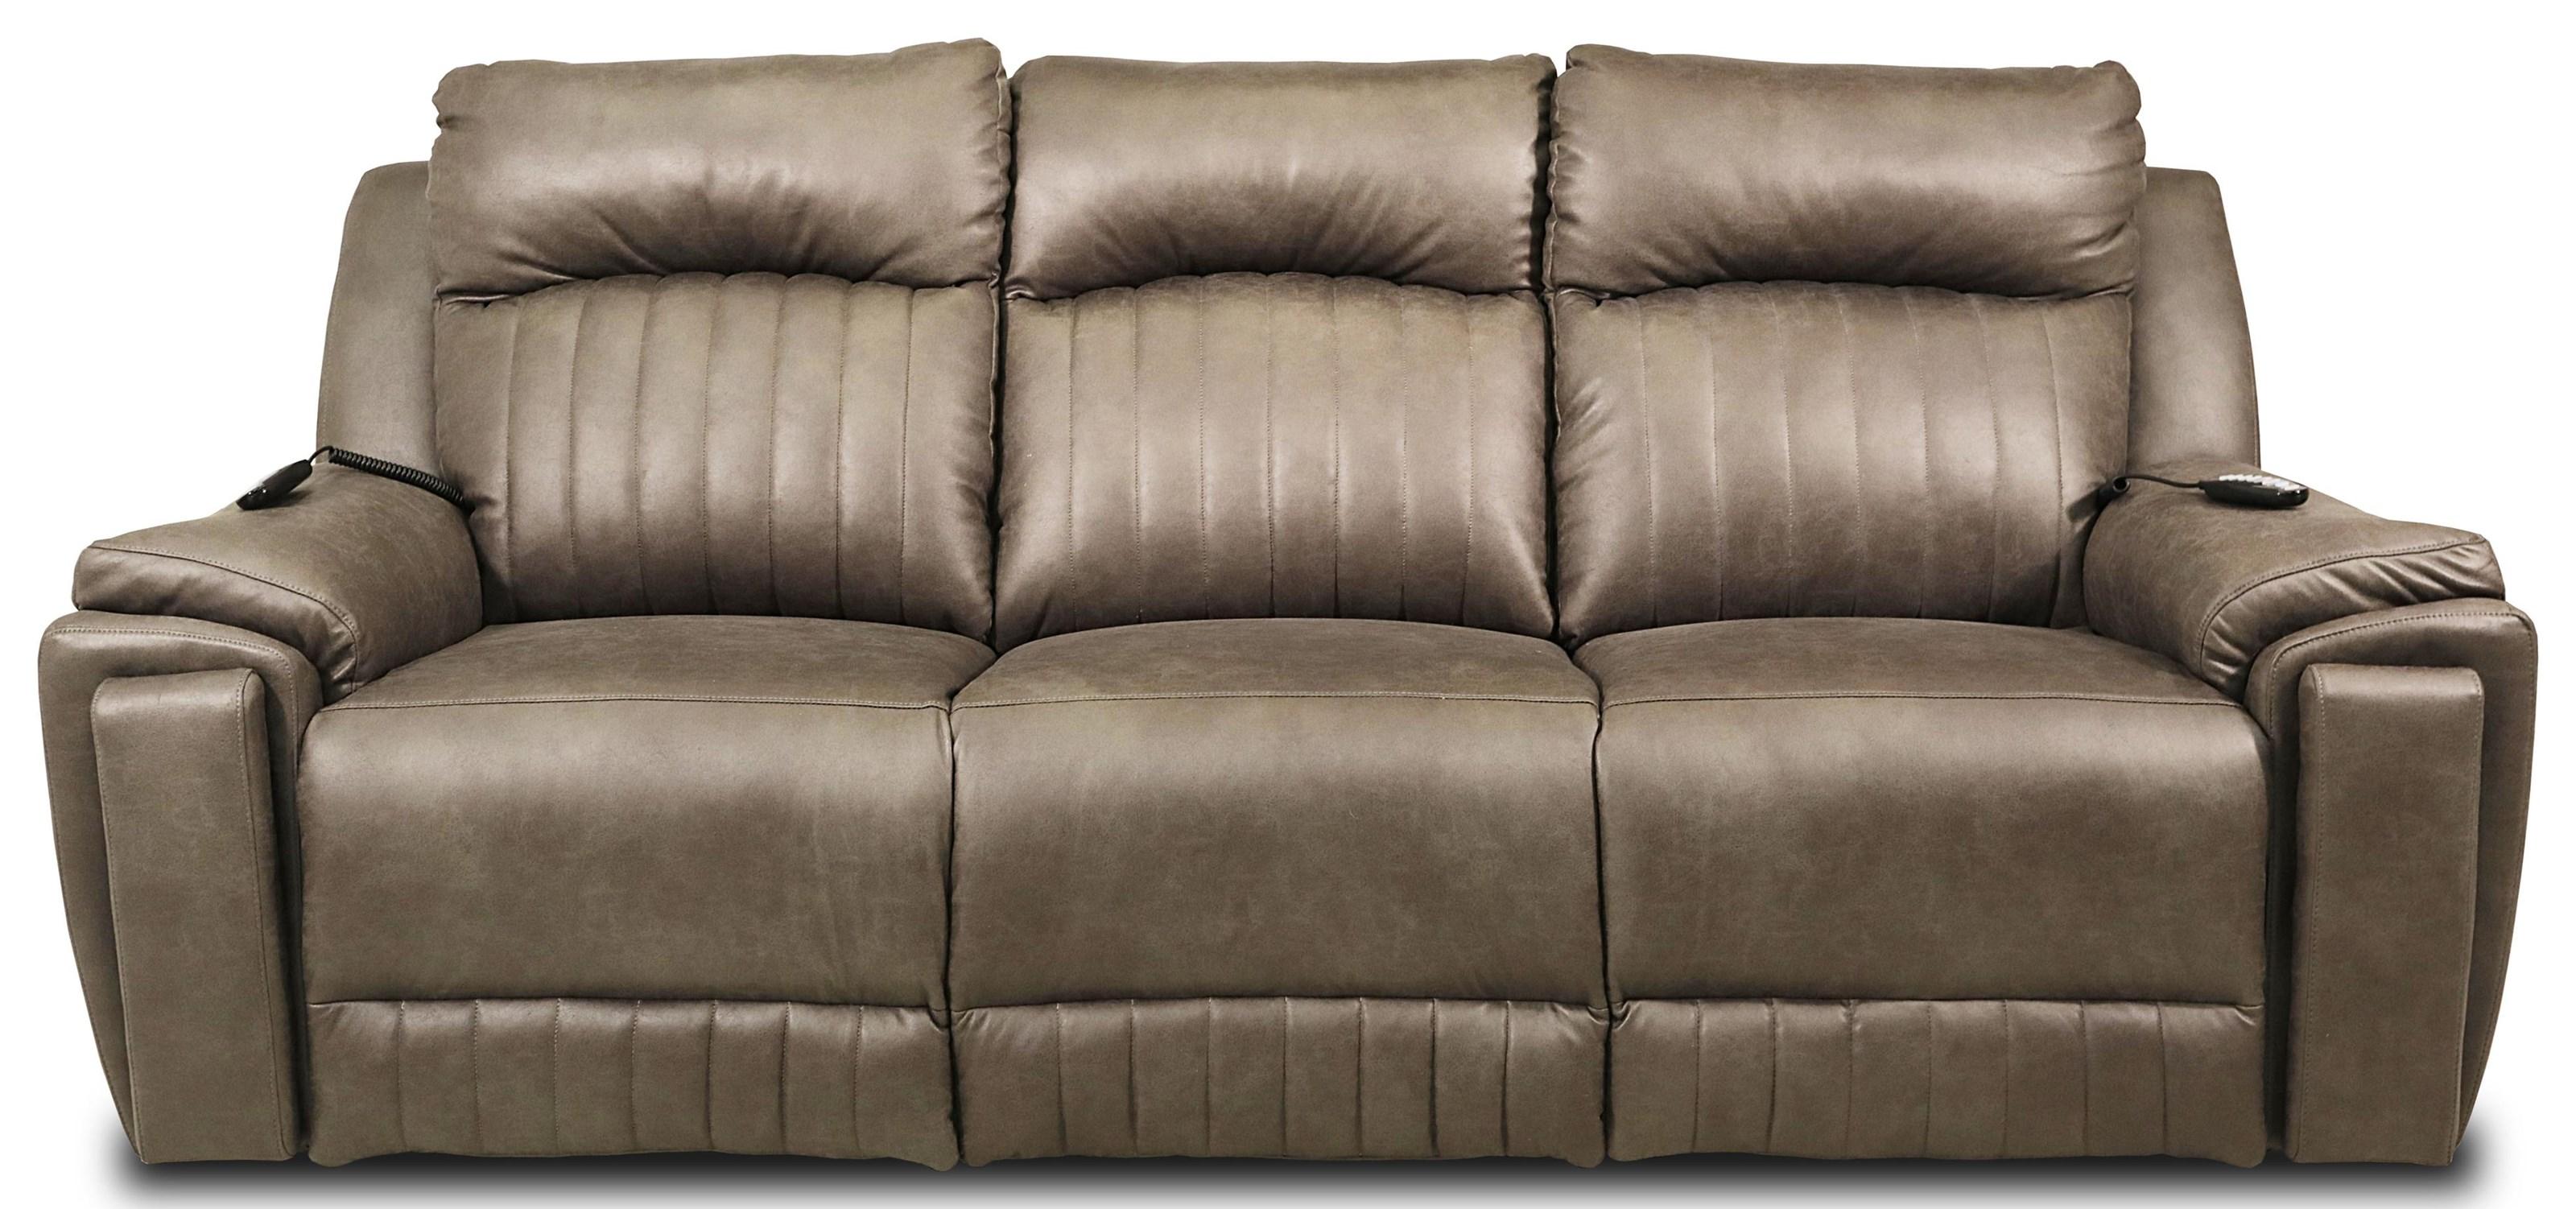 Power Headrest Sofa w/Hidden Cupholders